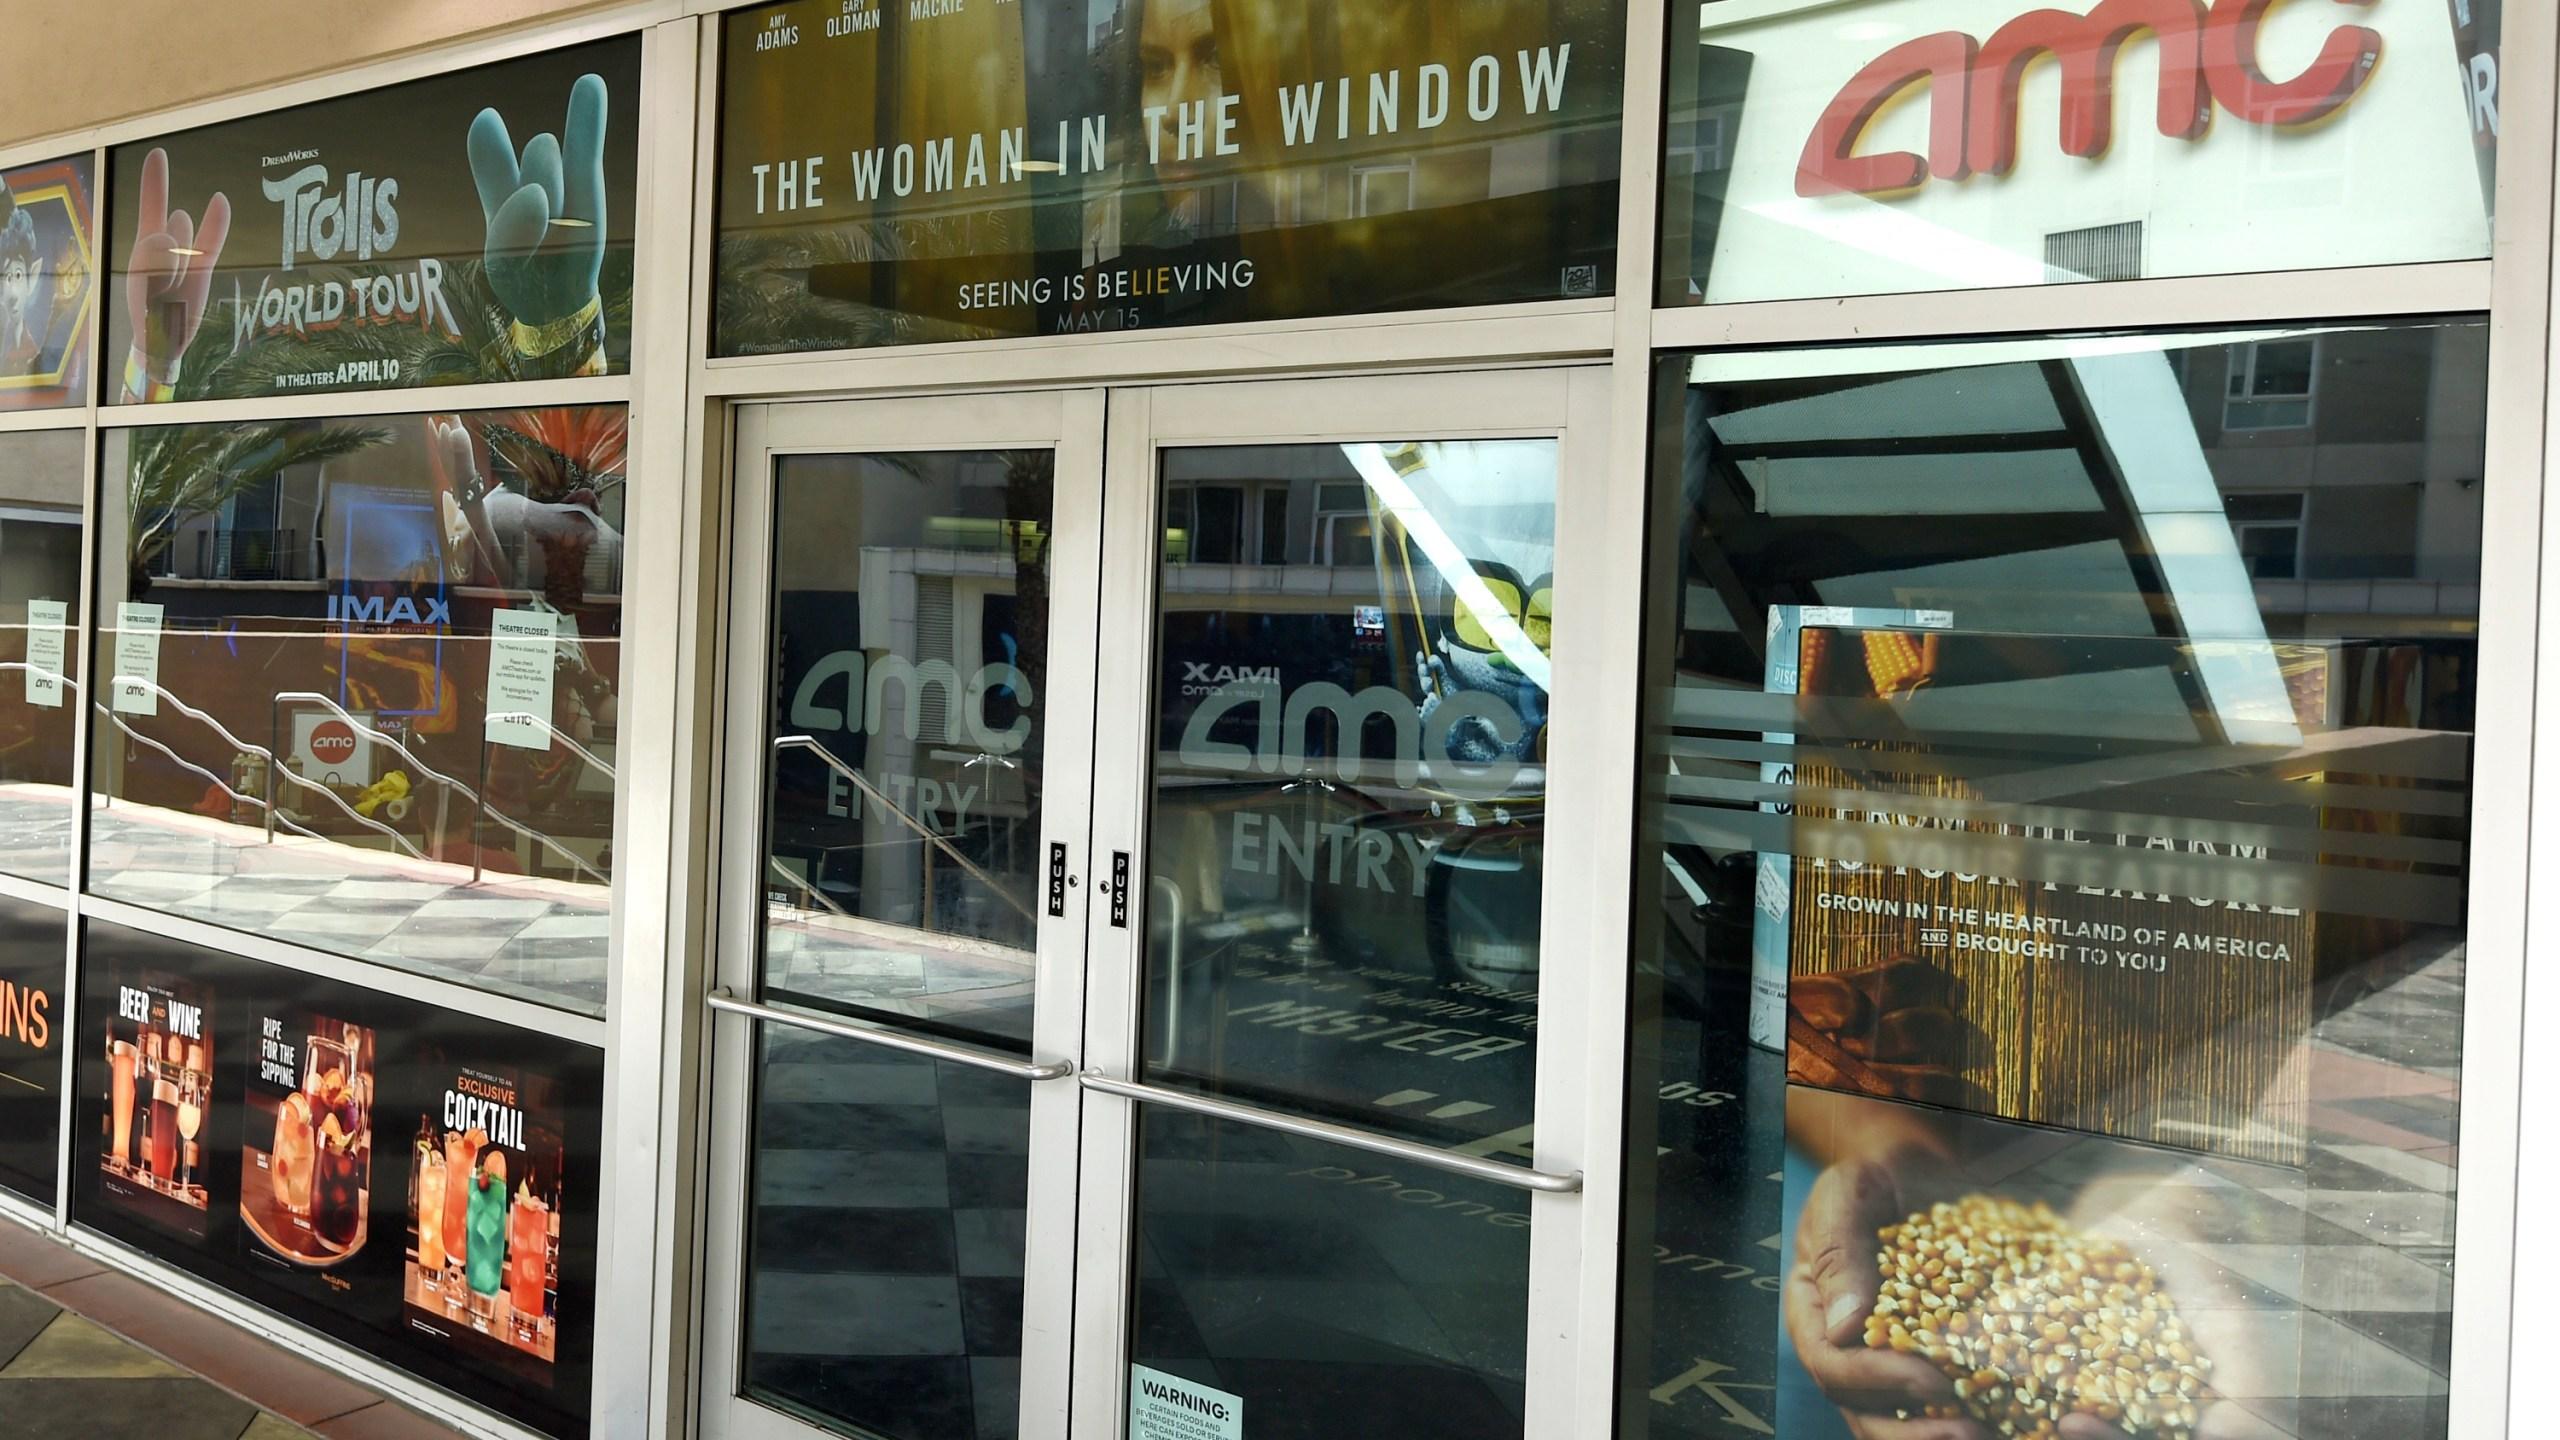 Amc Universal Agree To Shrink Theatrical Window To 17 Days Wavy Com